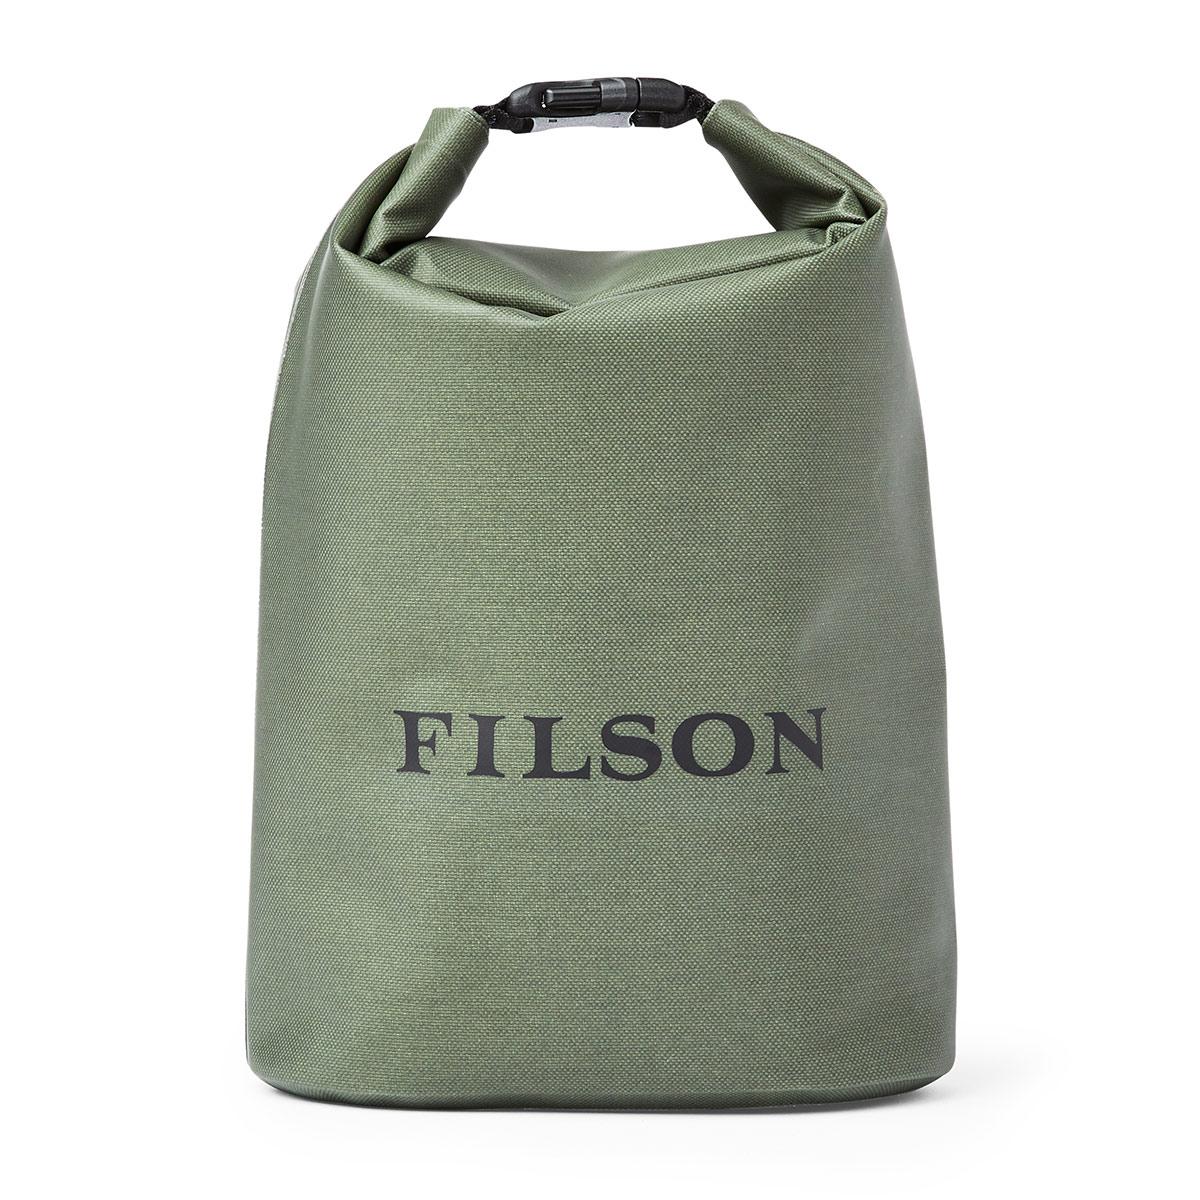 Filson Dry Bag Small 11020115947-Green